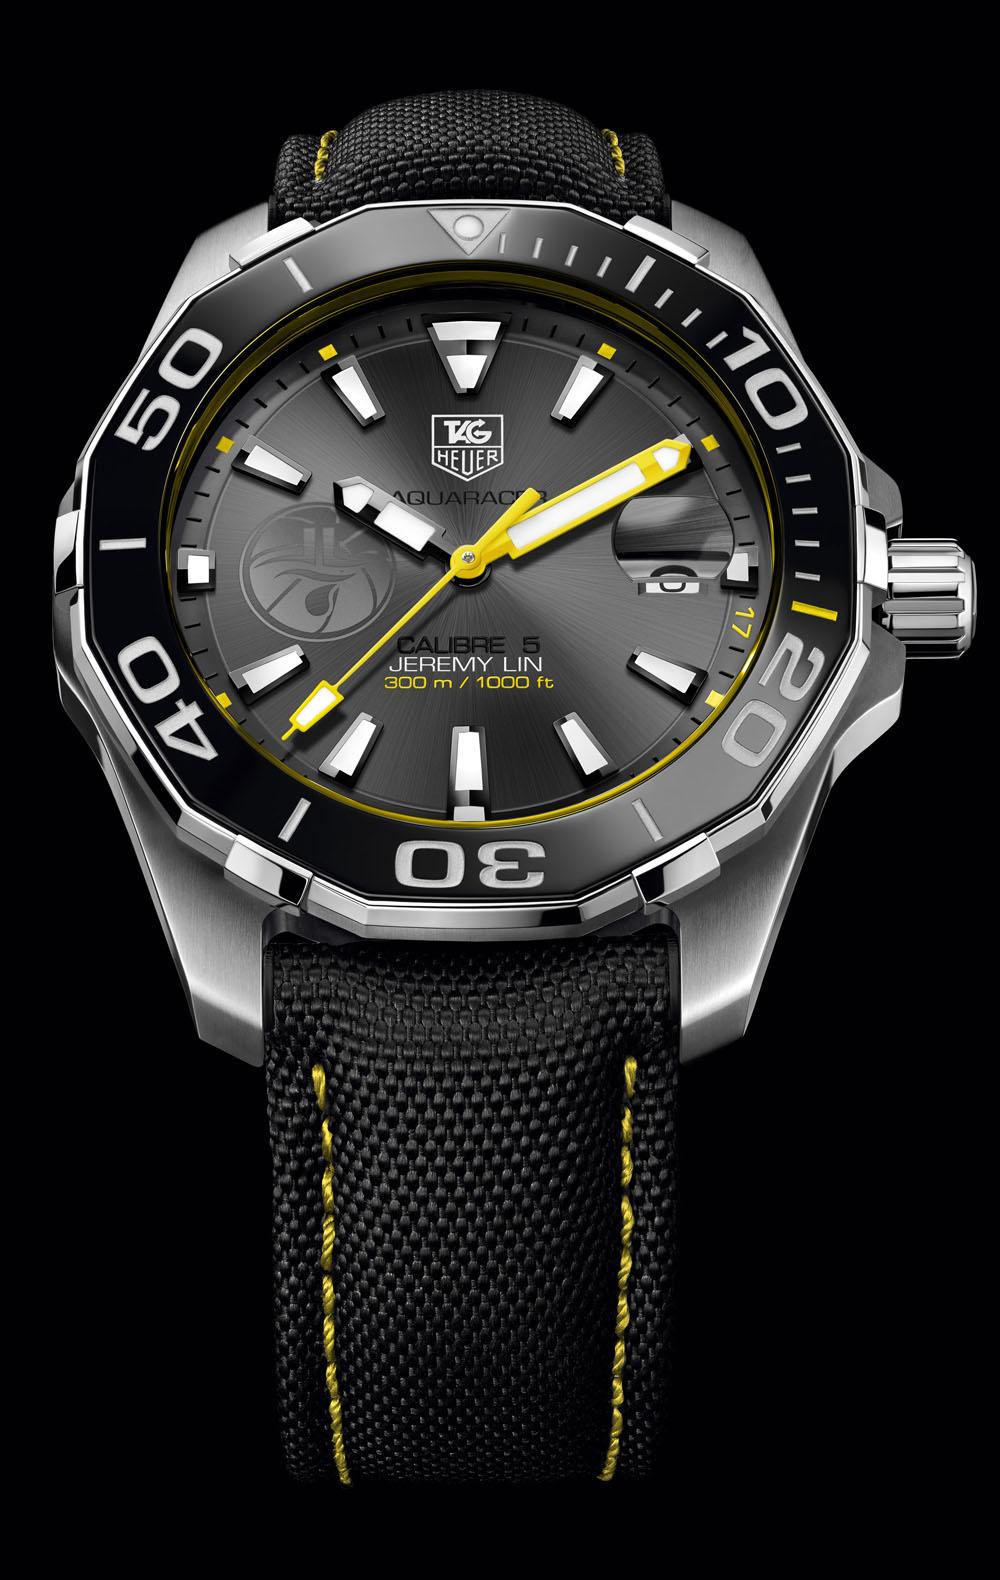 TAG Heuer Aquaracer 300M Calibre 5 Jeremy Lin Edition, illuminato da sfumature gialle